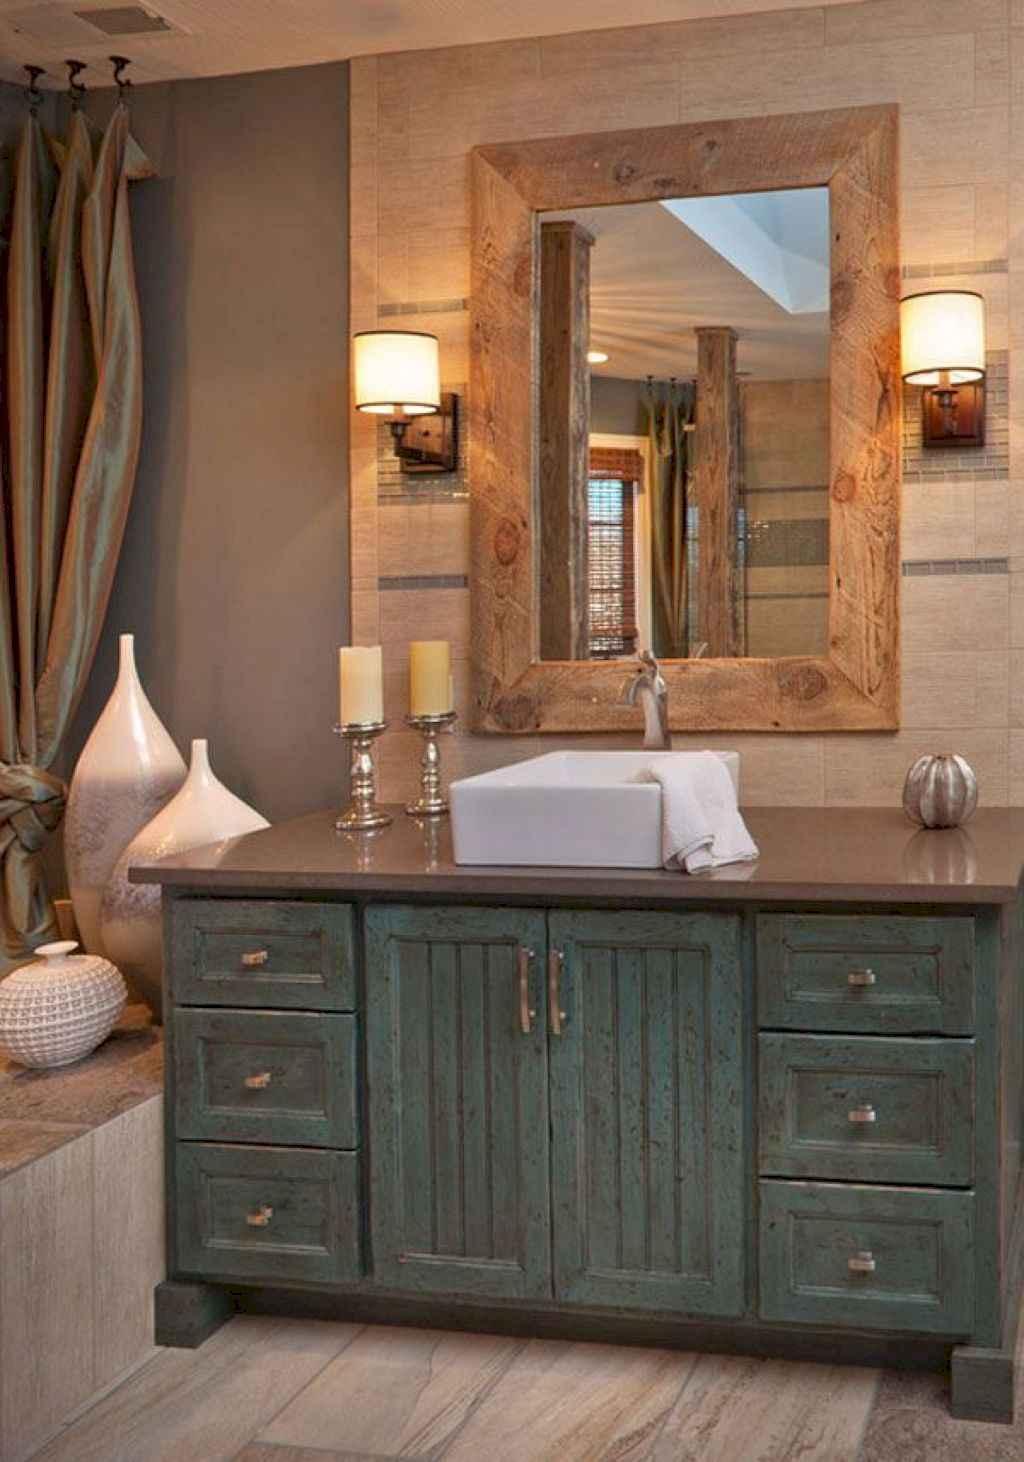 125 awesome farmhouse bathroom vanity remodel ideas (66)